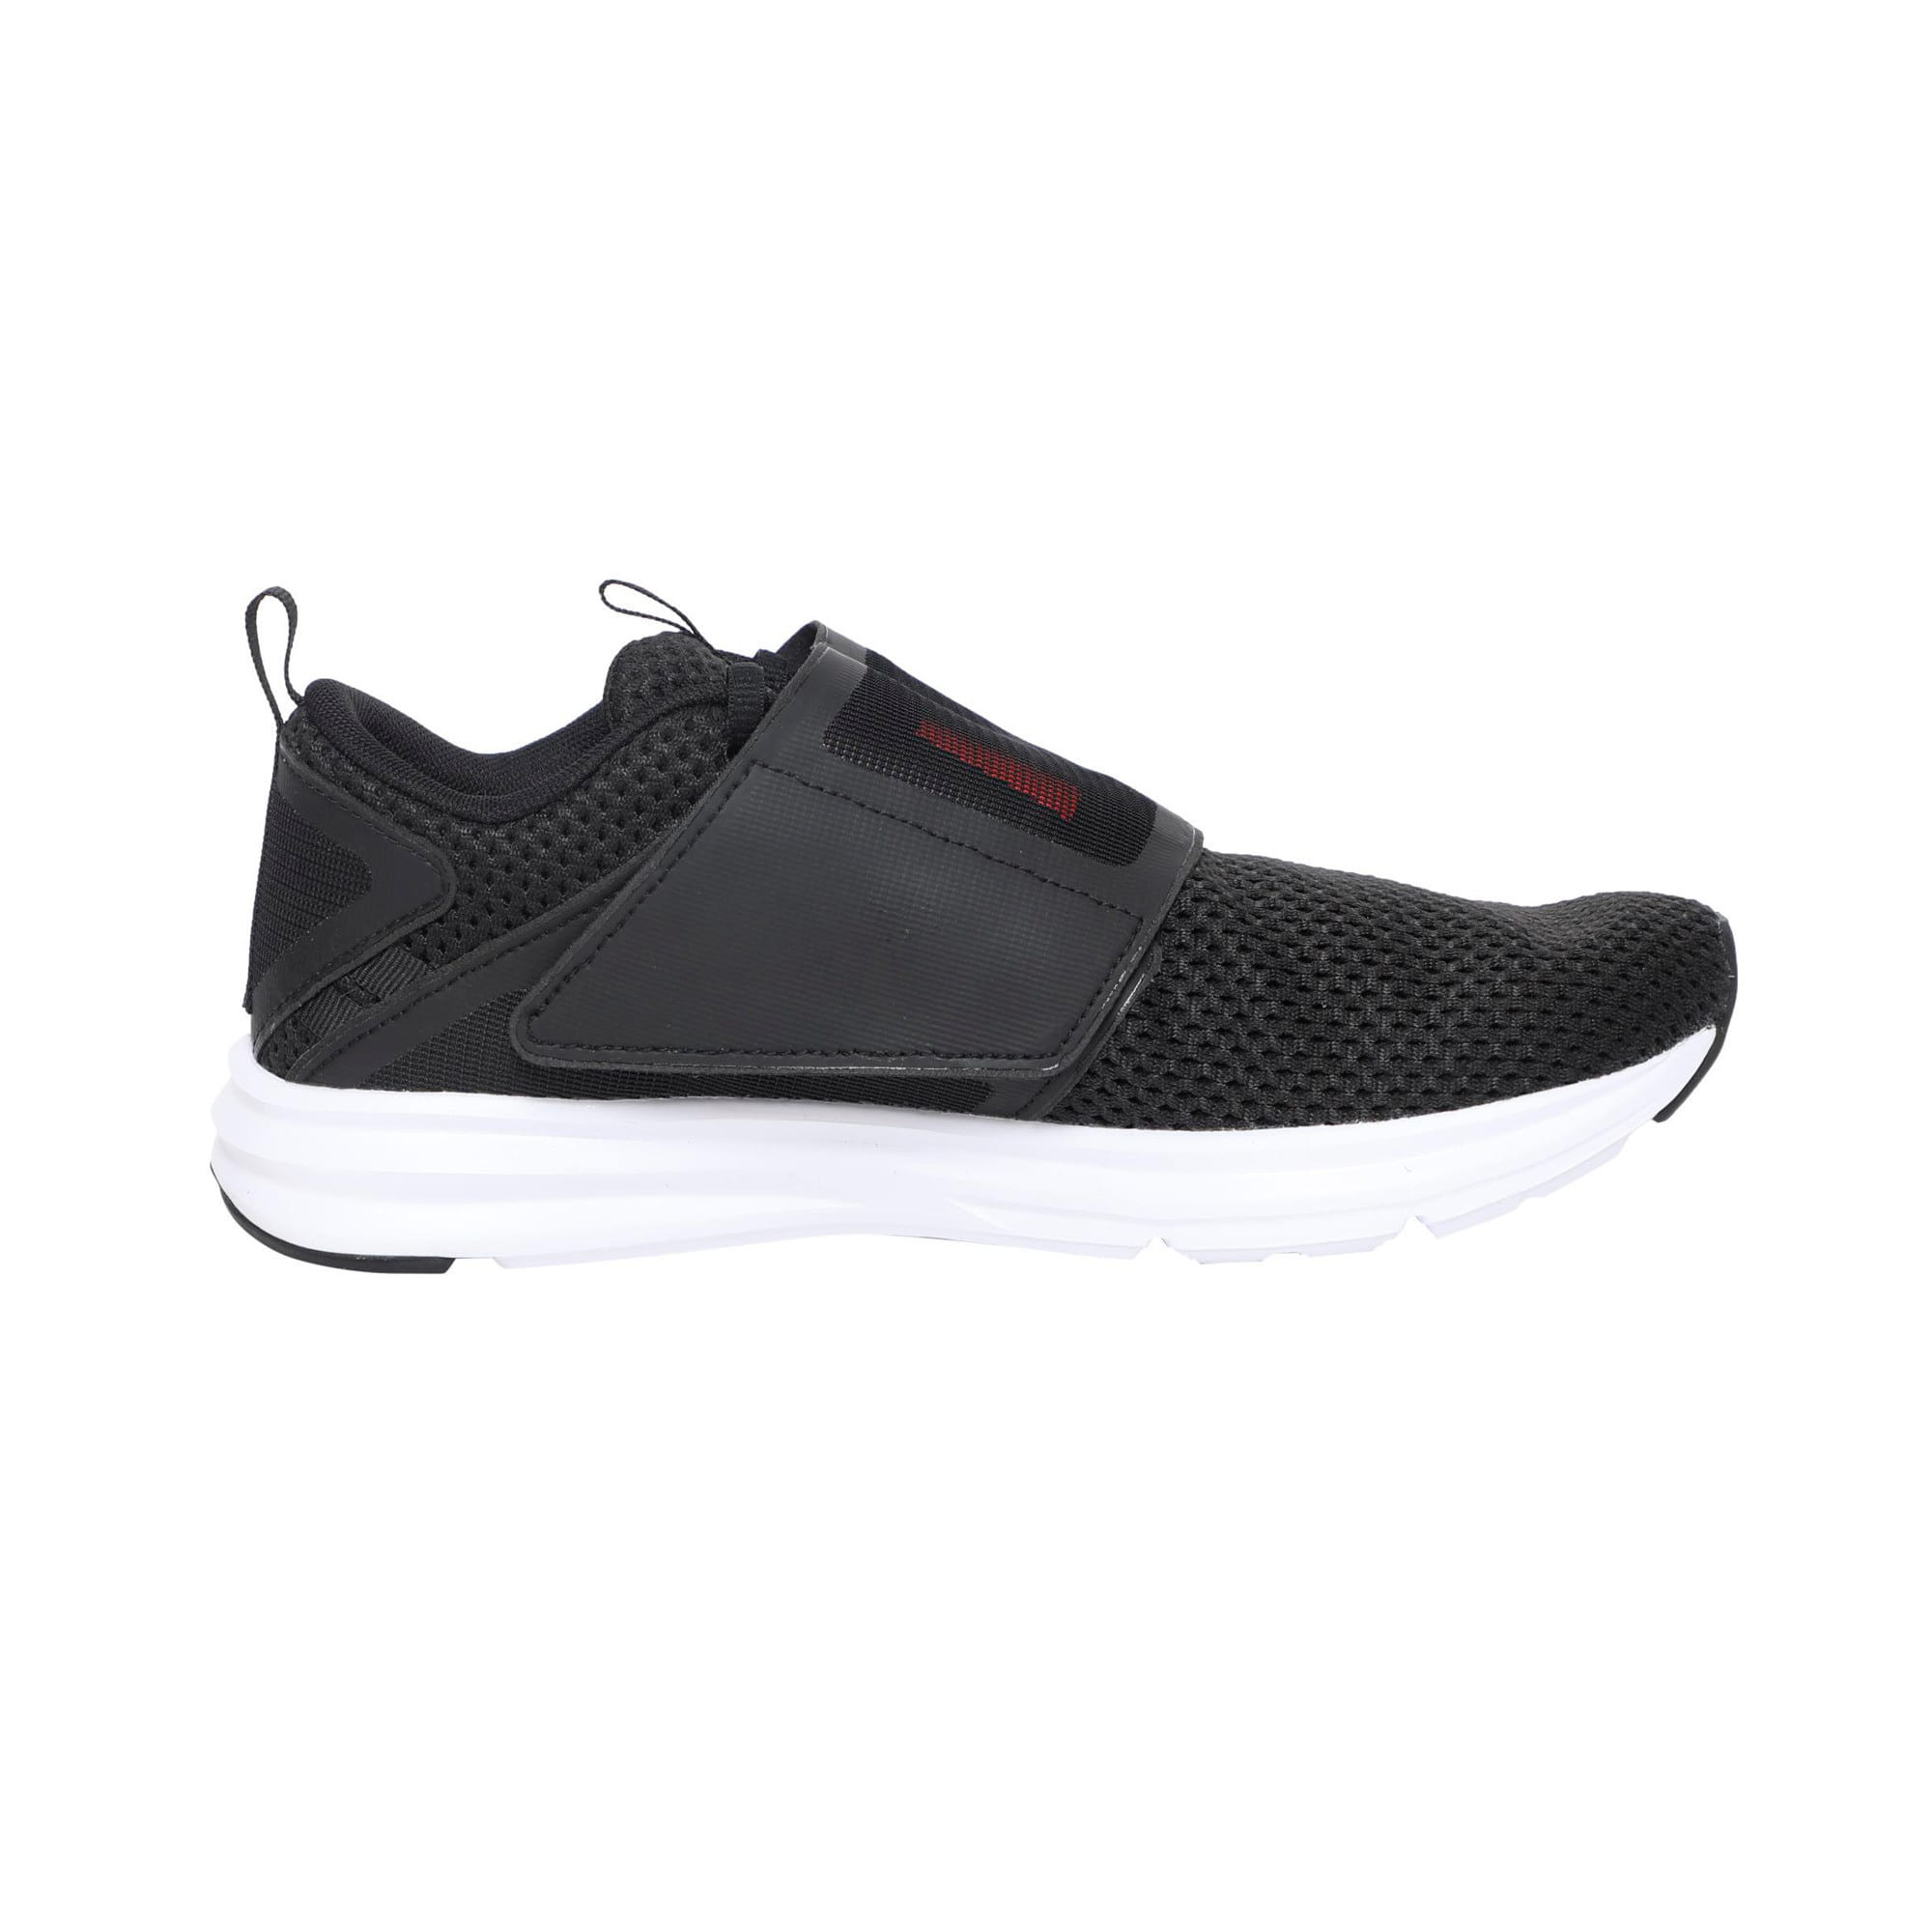 Thumbnail 5 of Enzo Strap Mesh Men's Running Shoes, Puma Black-Flame Scarlet, medium-IND